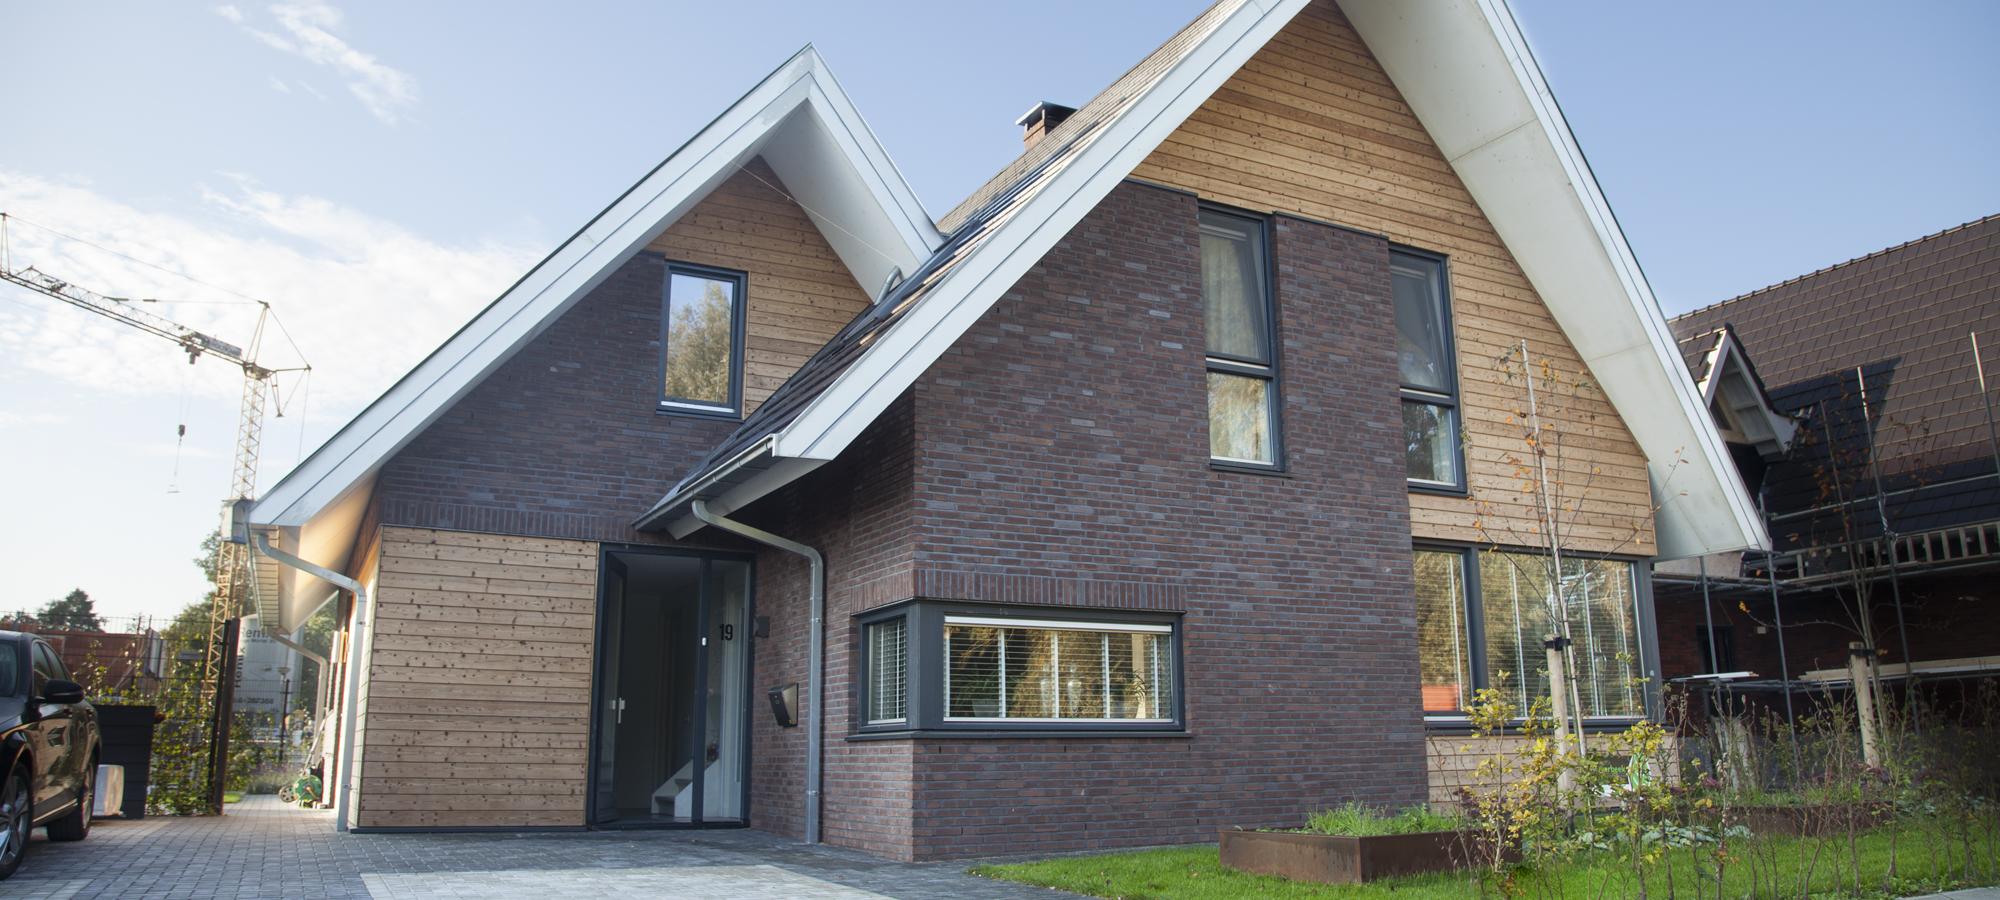 Focus architectuur vrijstaande woning for Moderne vrijstaande woning